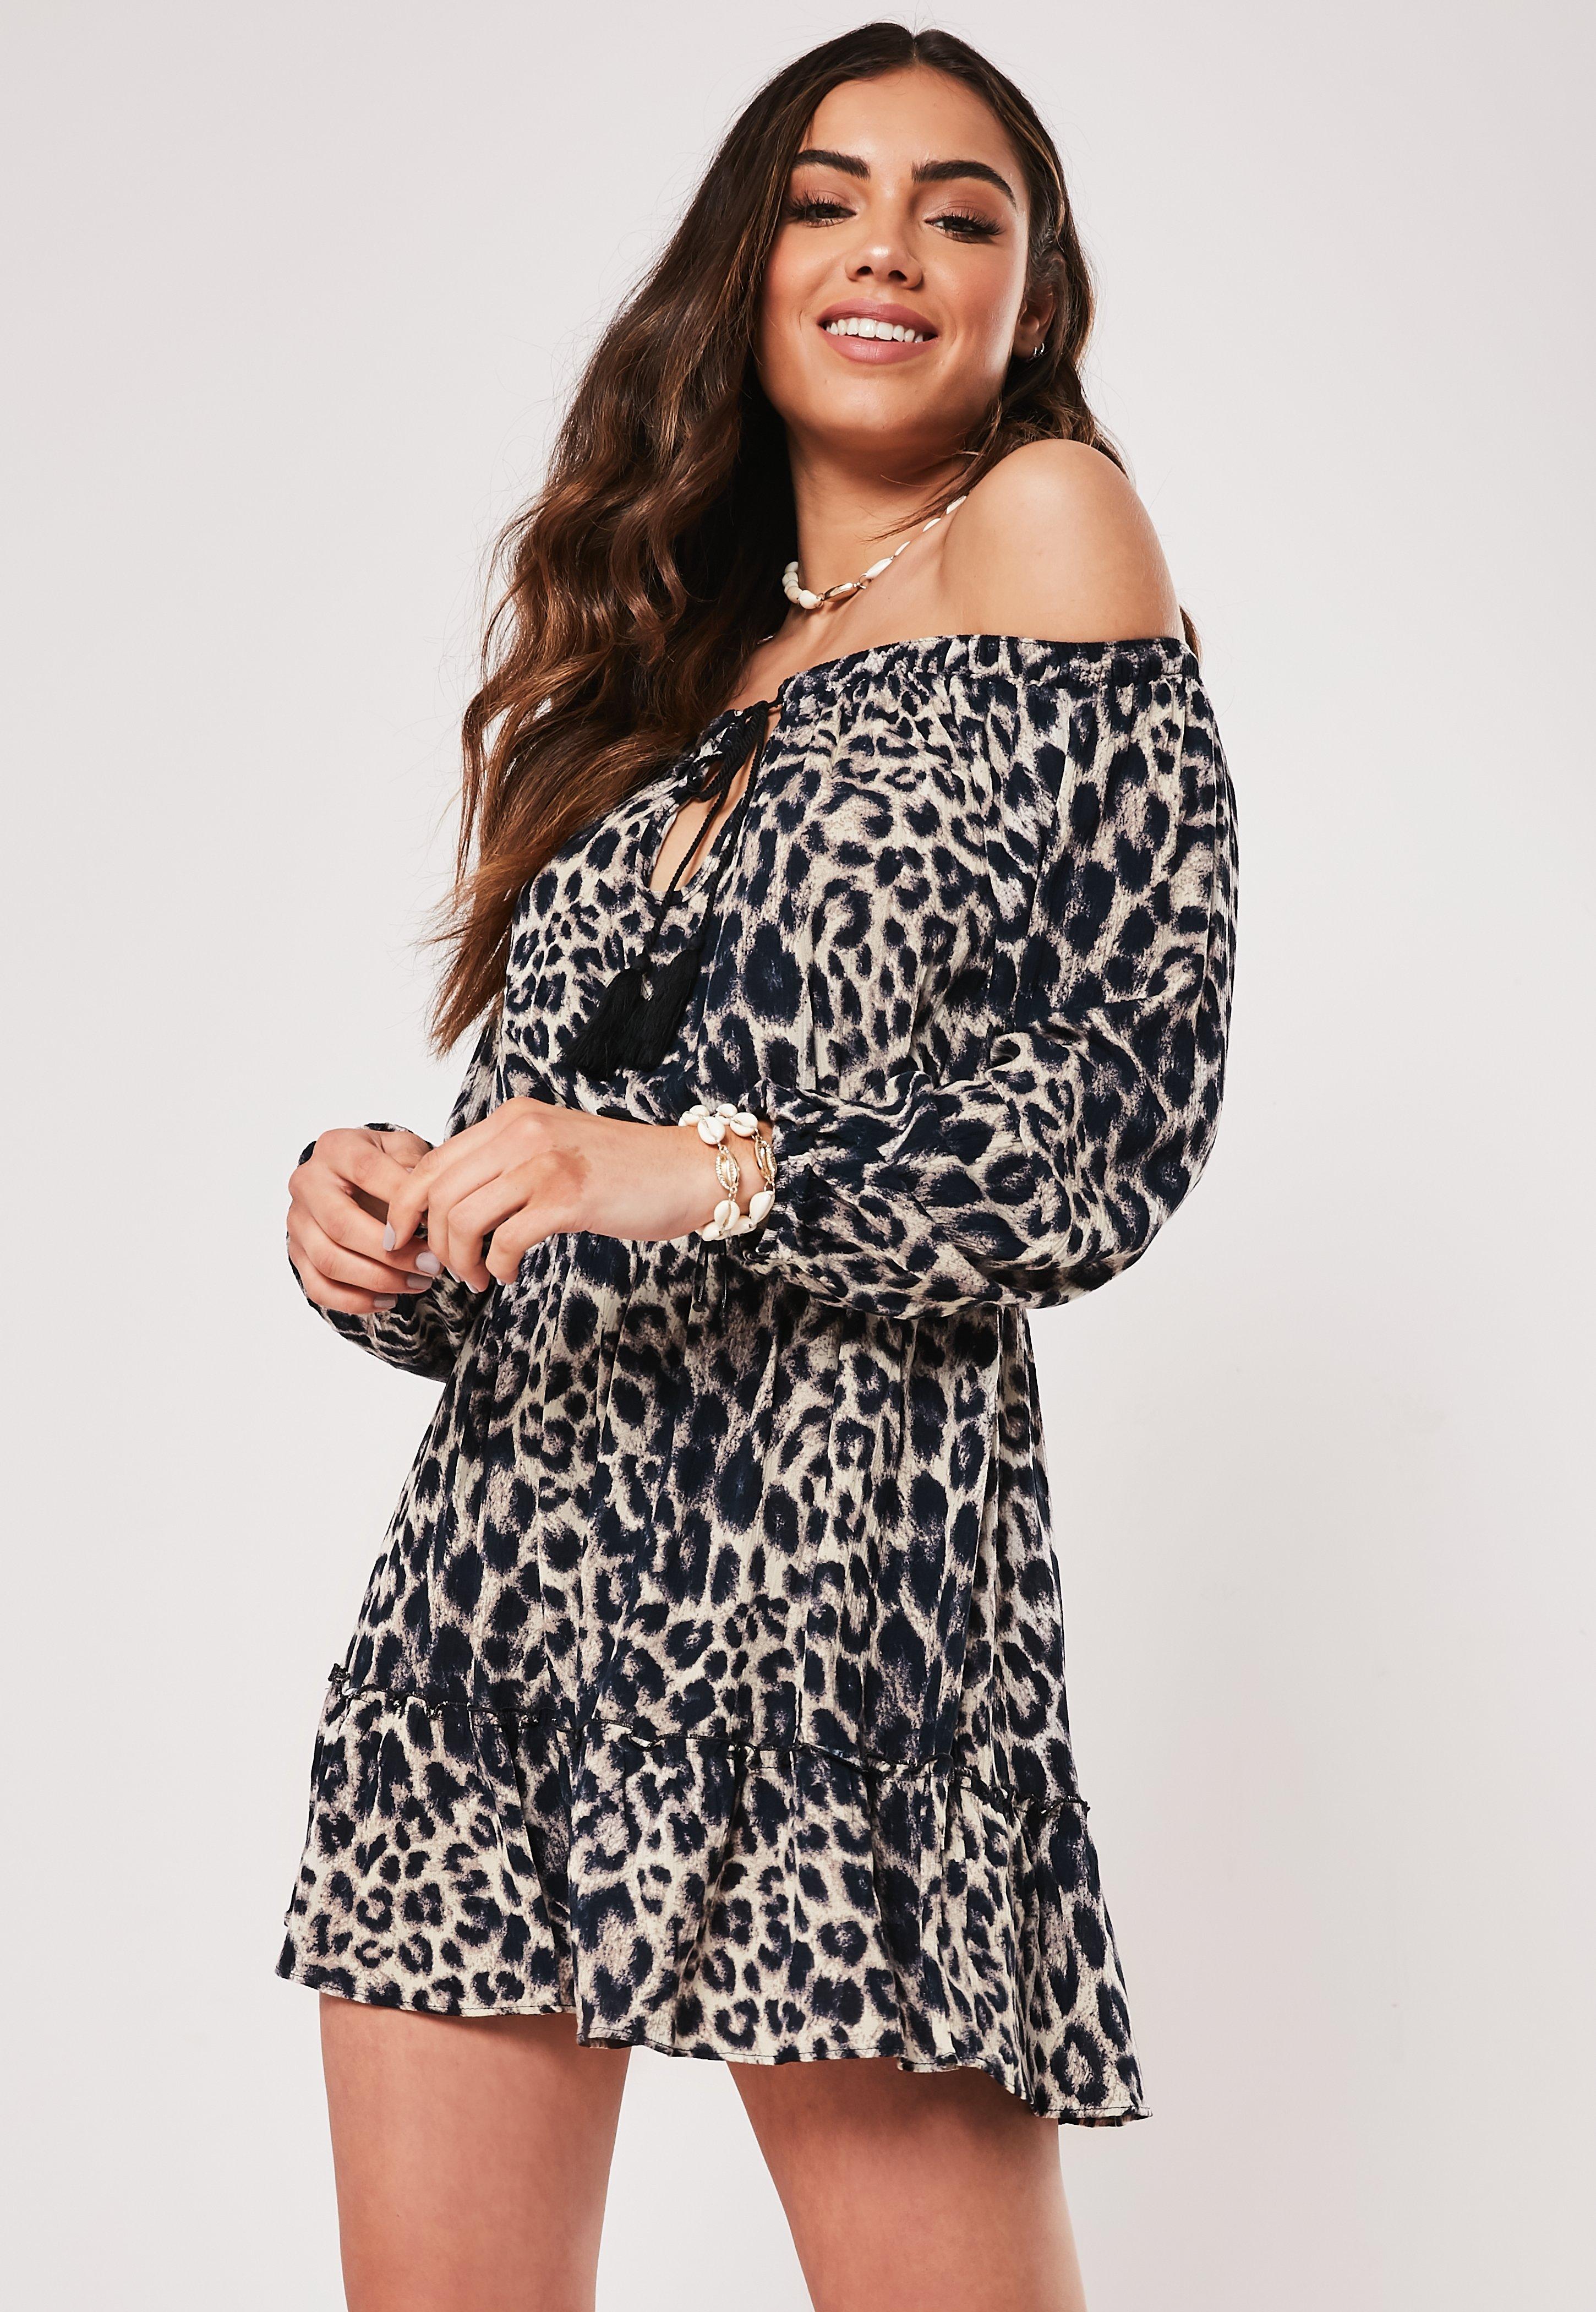 231093fc1848d9 Animal Print Clothing | Snake & Leopard Print Dresses - Missguided